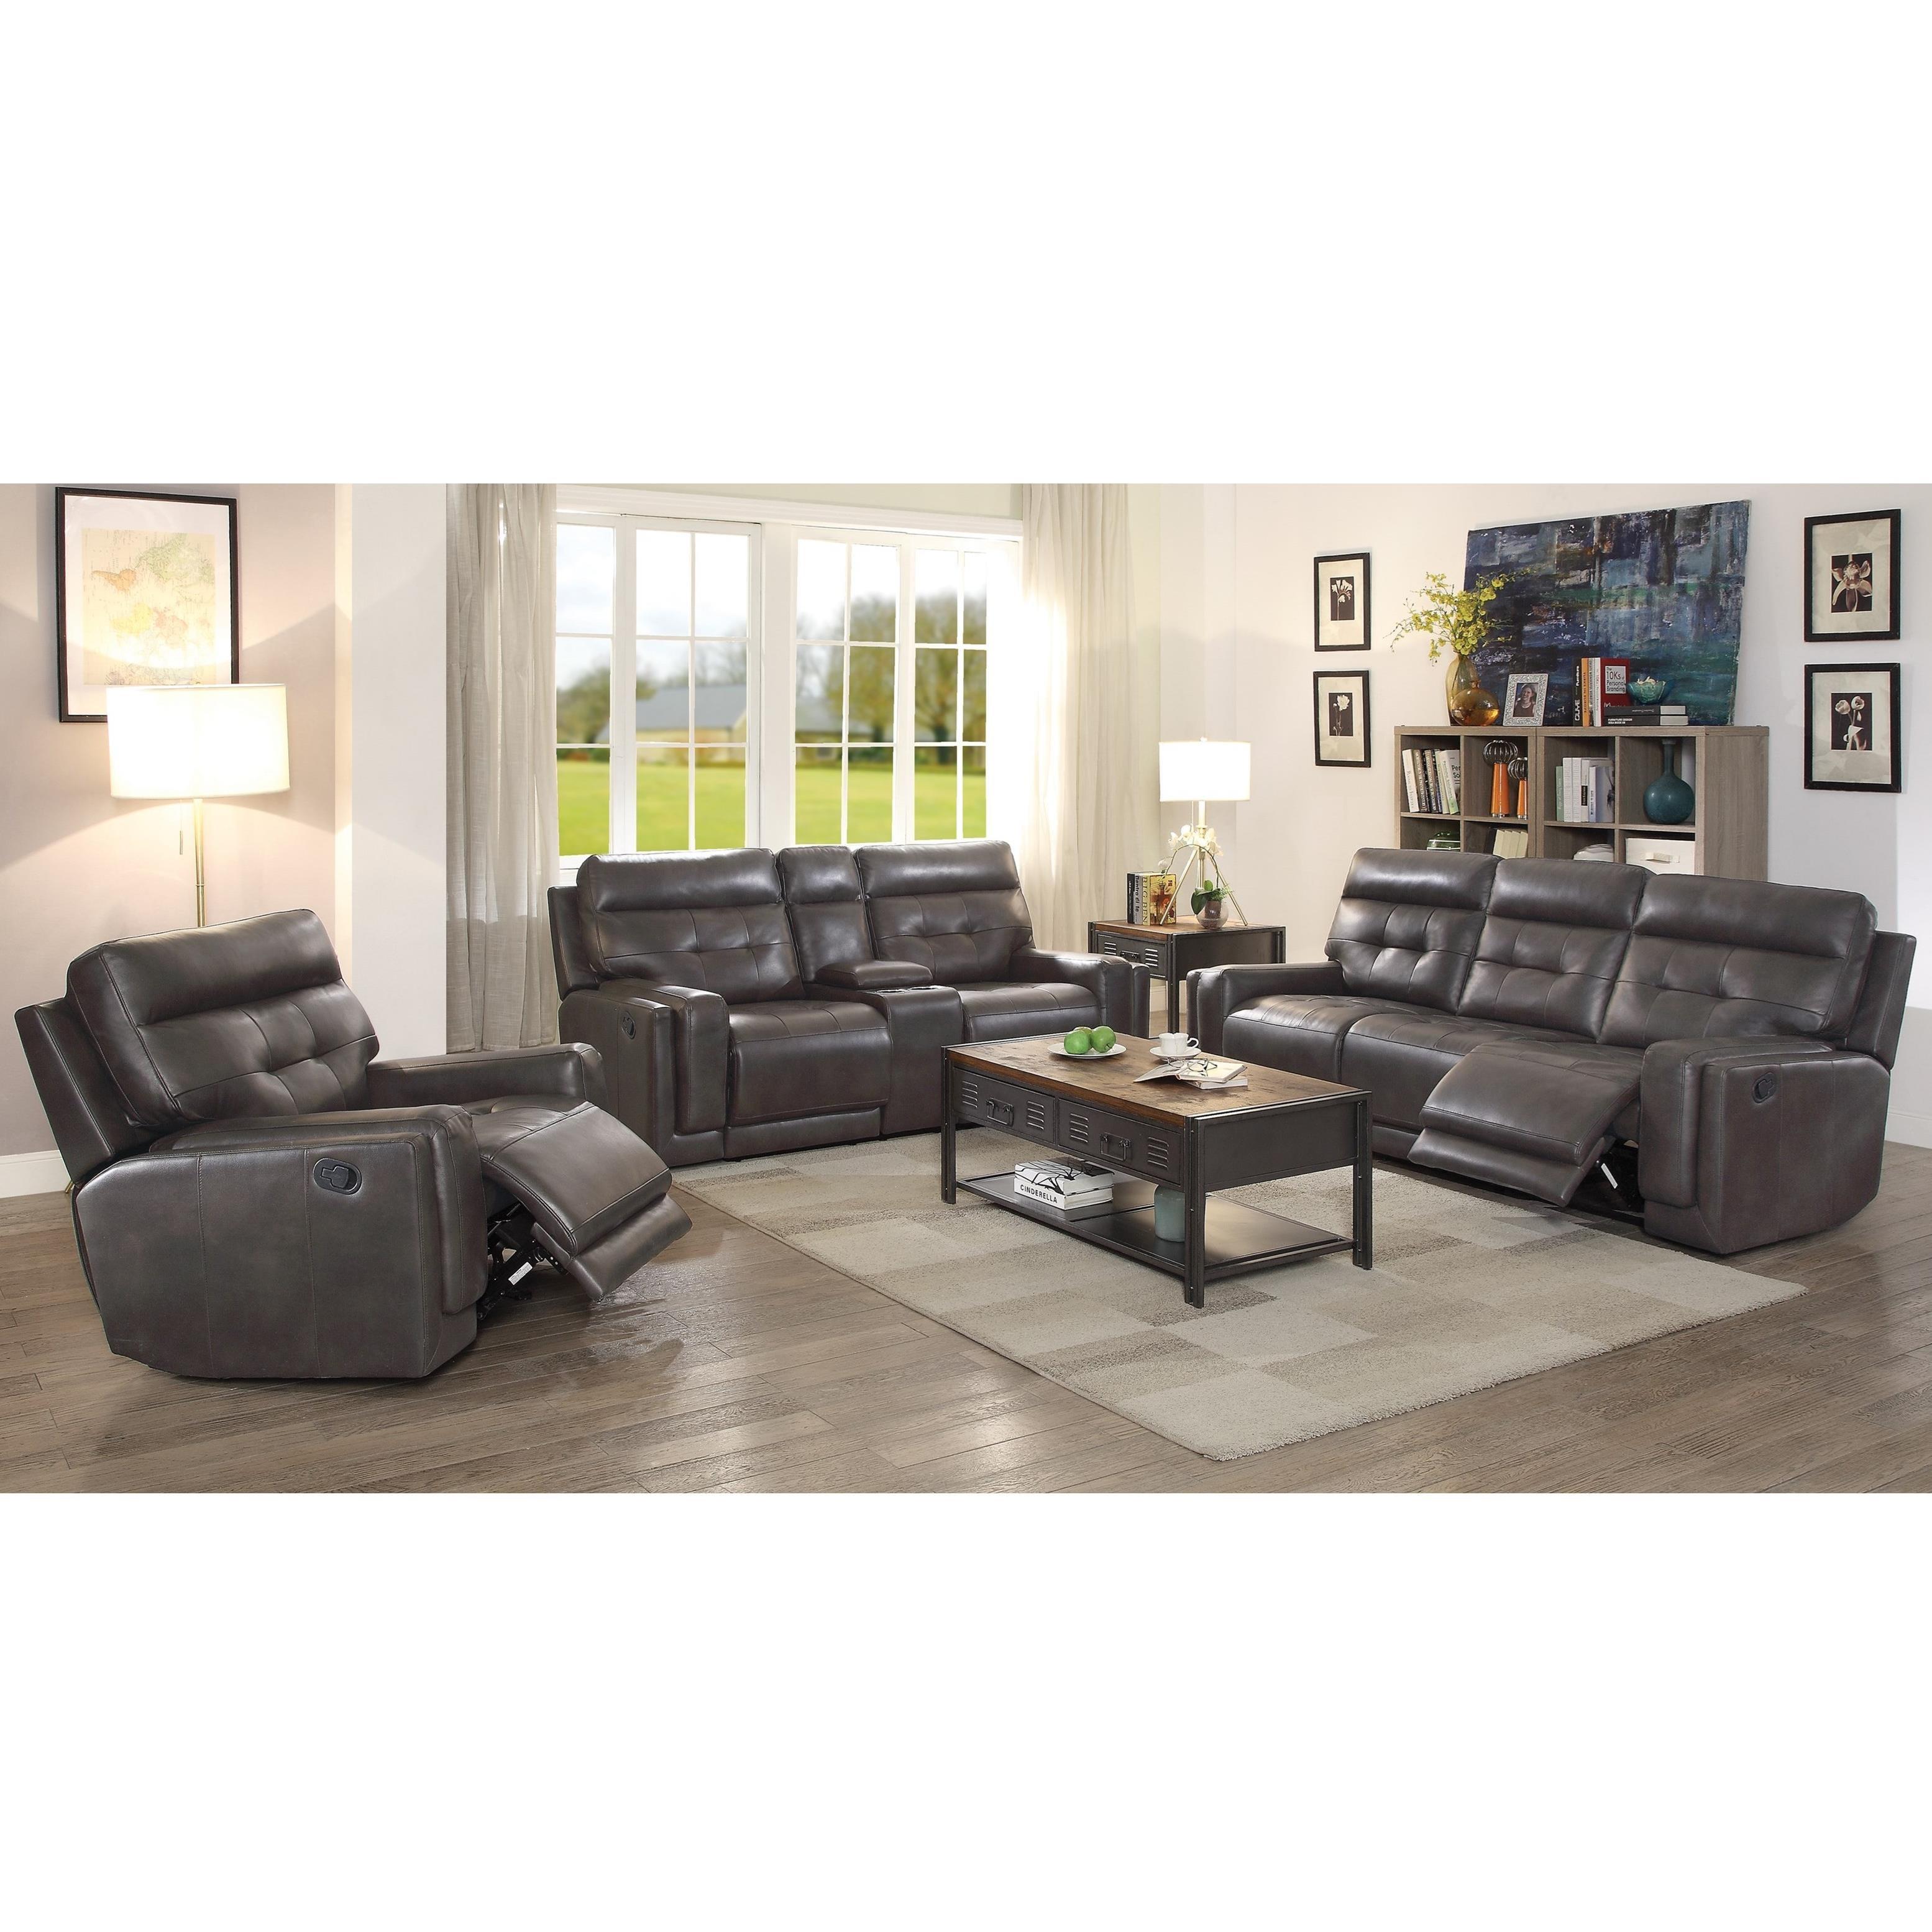 Coaster Trenton Reclining Living Room Group Dunk Bright Furniture R